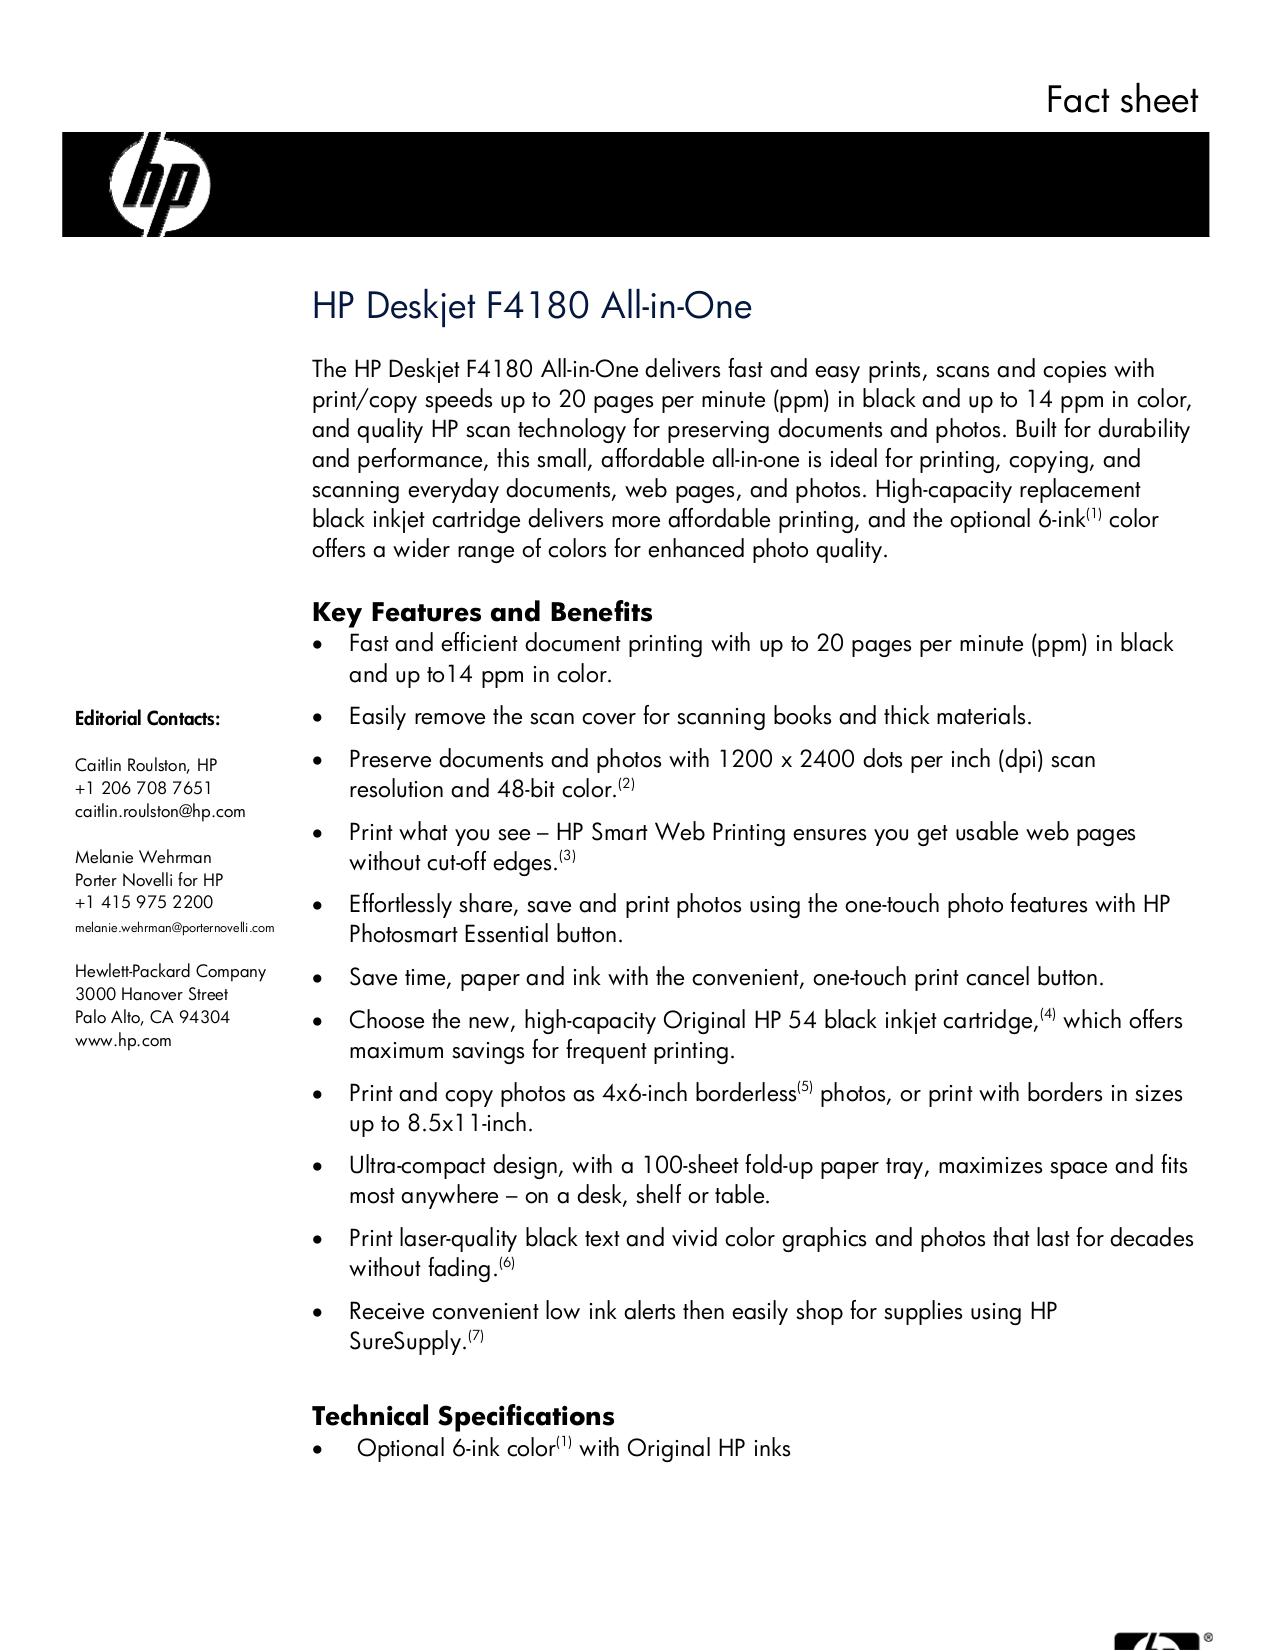 download free pdf for hp deskjet f4180 multifunction printer manual rh umlib com hp deskjet f4180 manual hp f4180 manual pdf